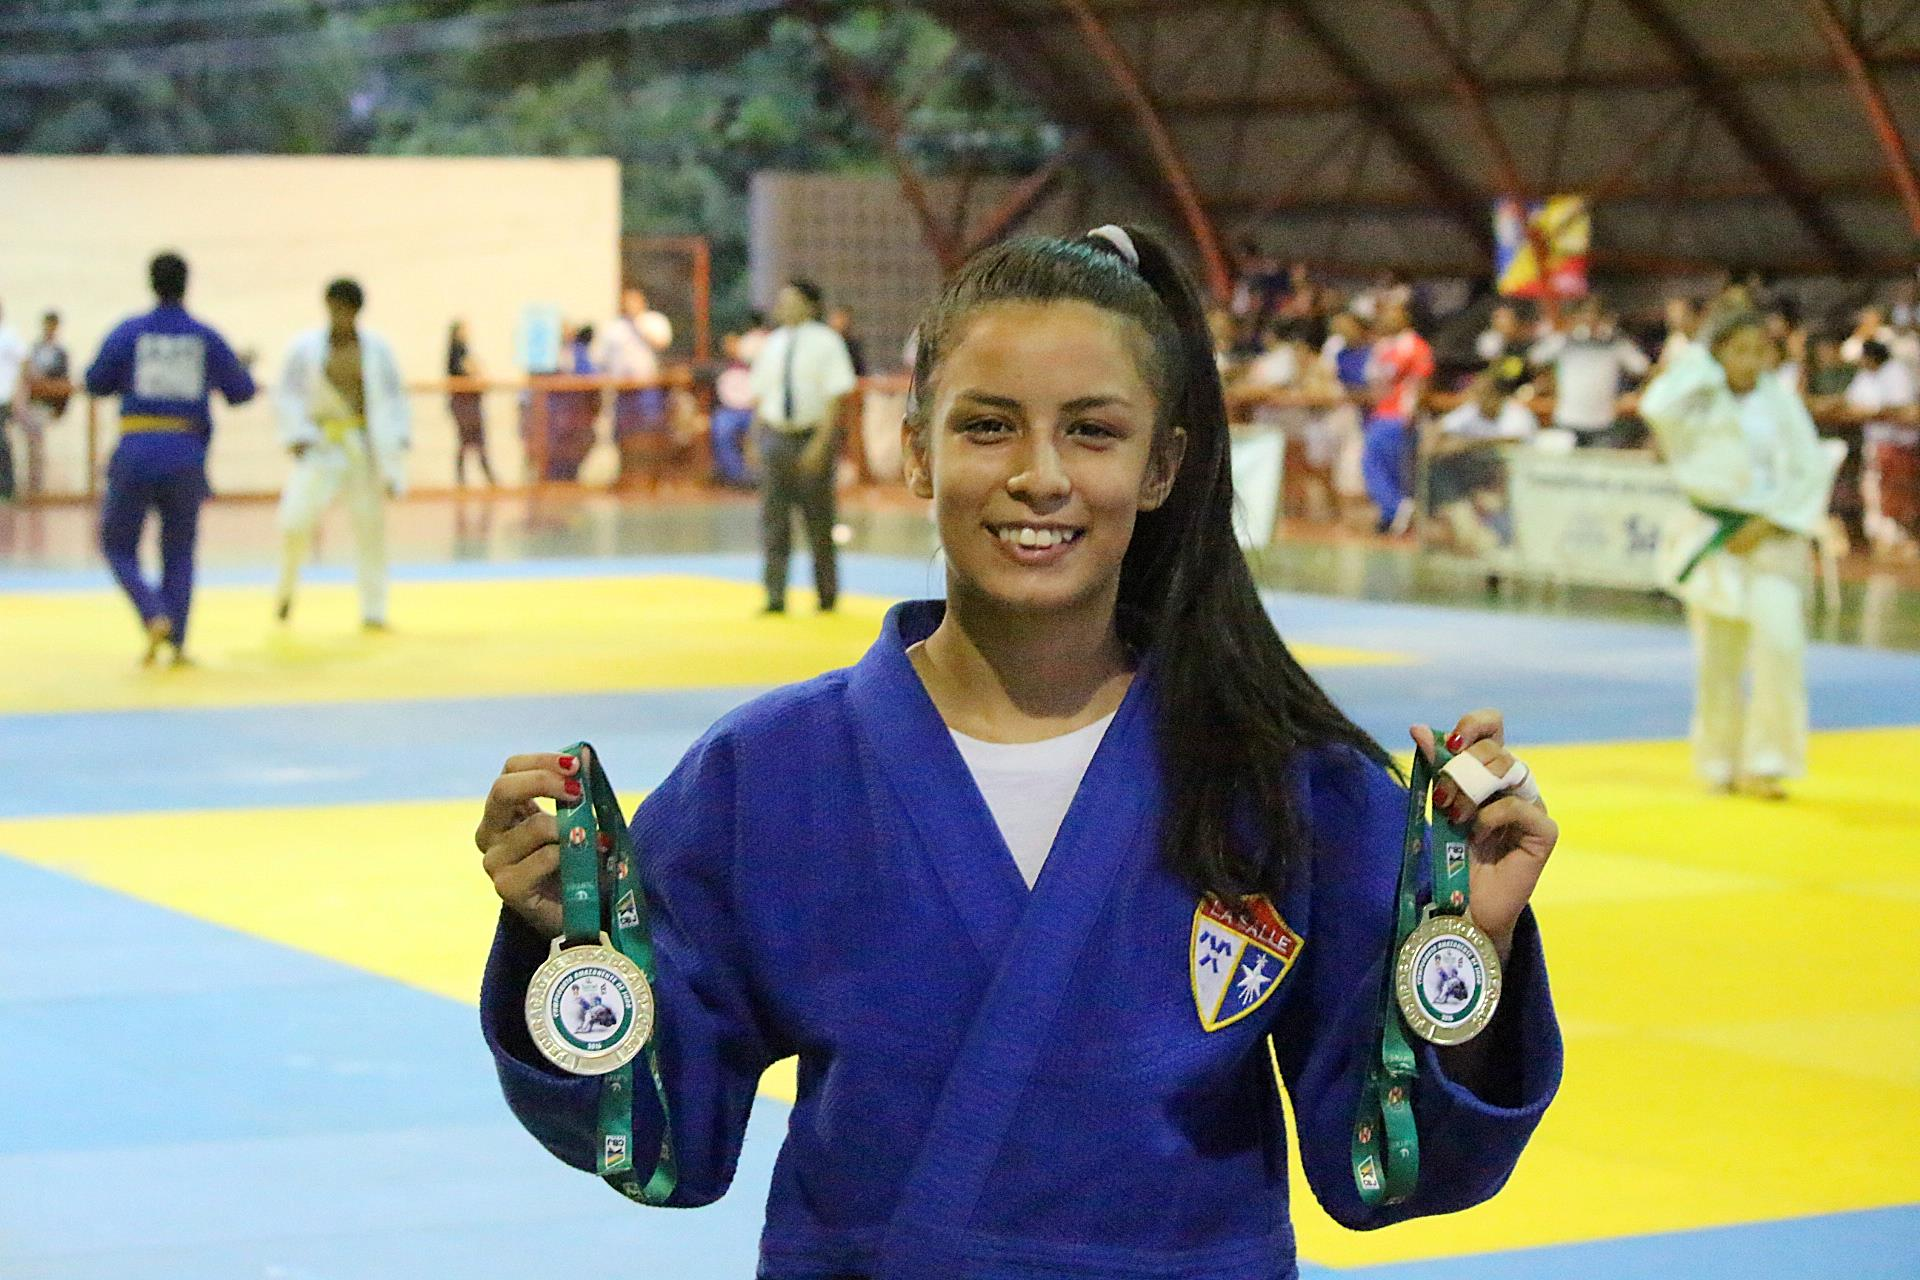 judo-thalia-naihara-campea-do-sub-18-e-sub-21-foto-1-by-emanuel-mendes-siqueira